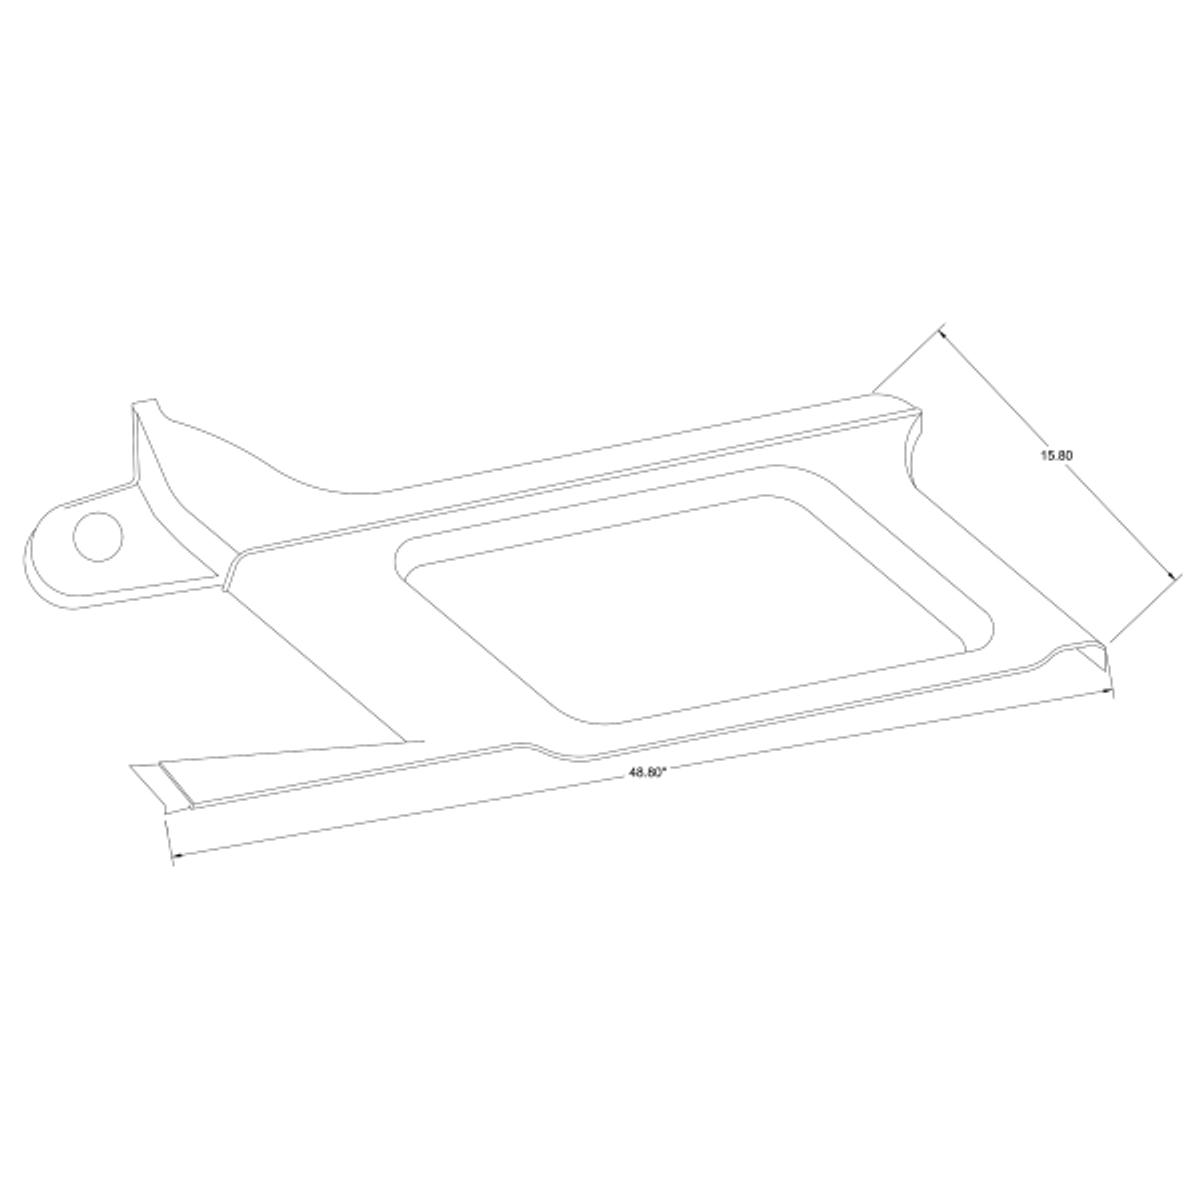 RH Forward Moulding, Cessna 206 part 1215105-1